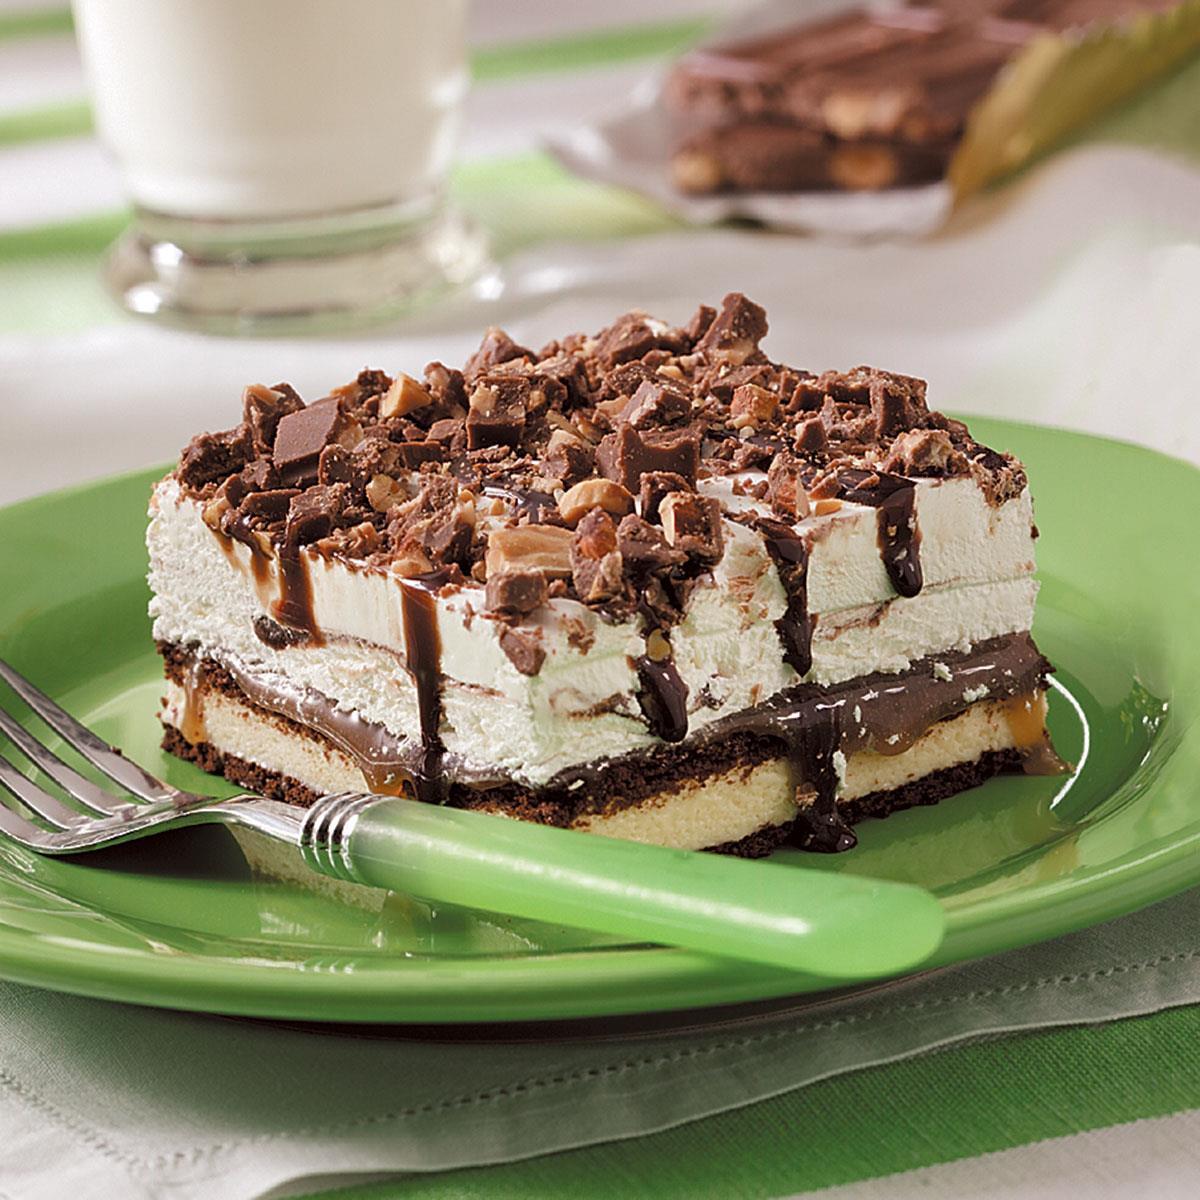 Ice Cream Sandwich Desserts Recipes  Easy Ice Cream Sandwich Dessert Recipe